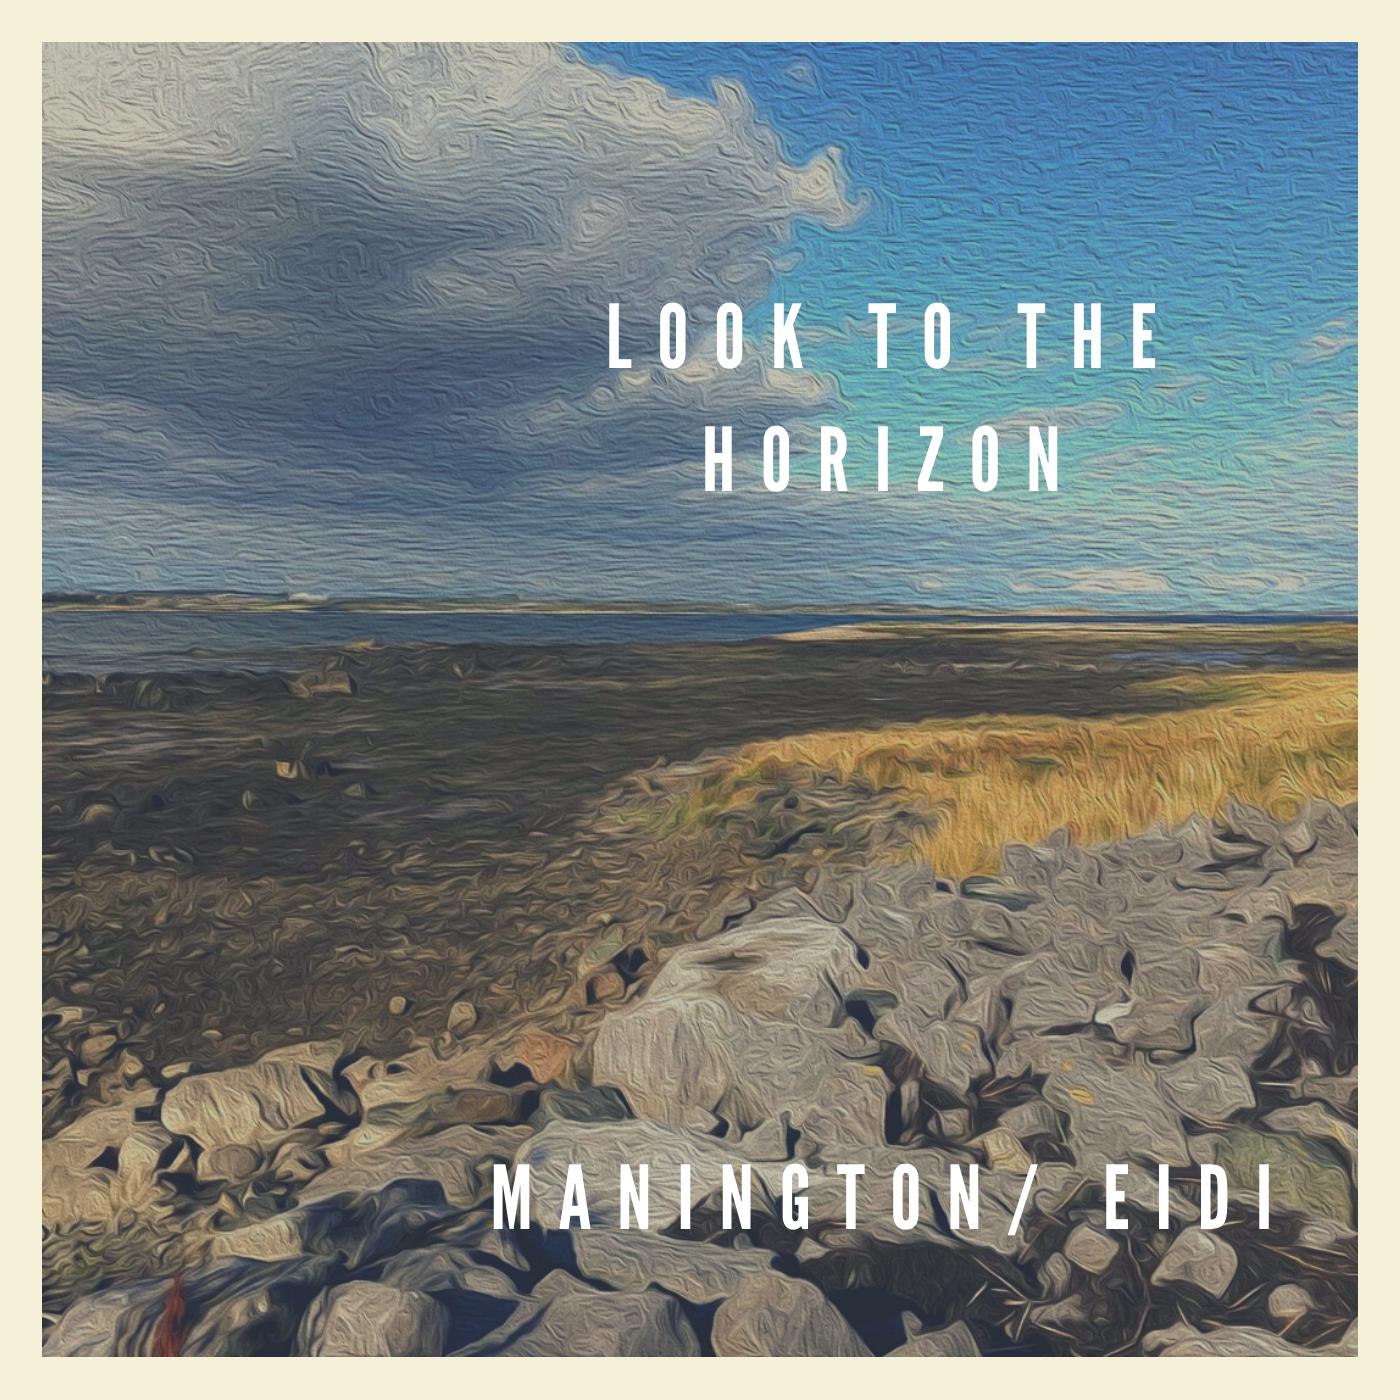 Look to the Horizon - Track Artwork